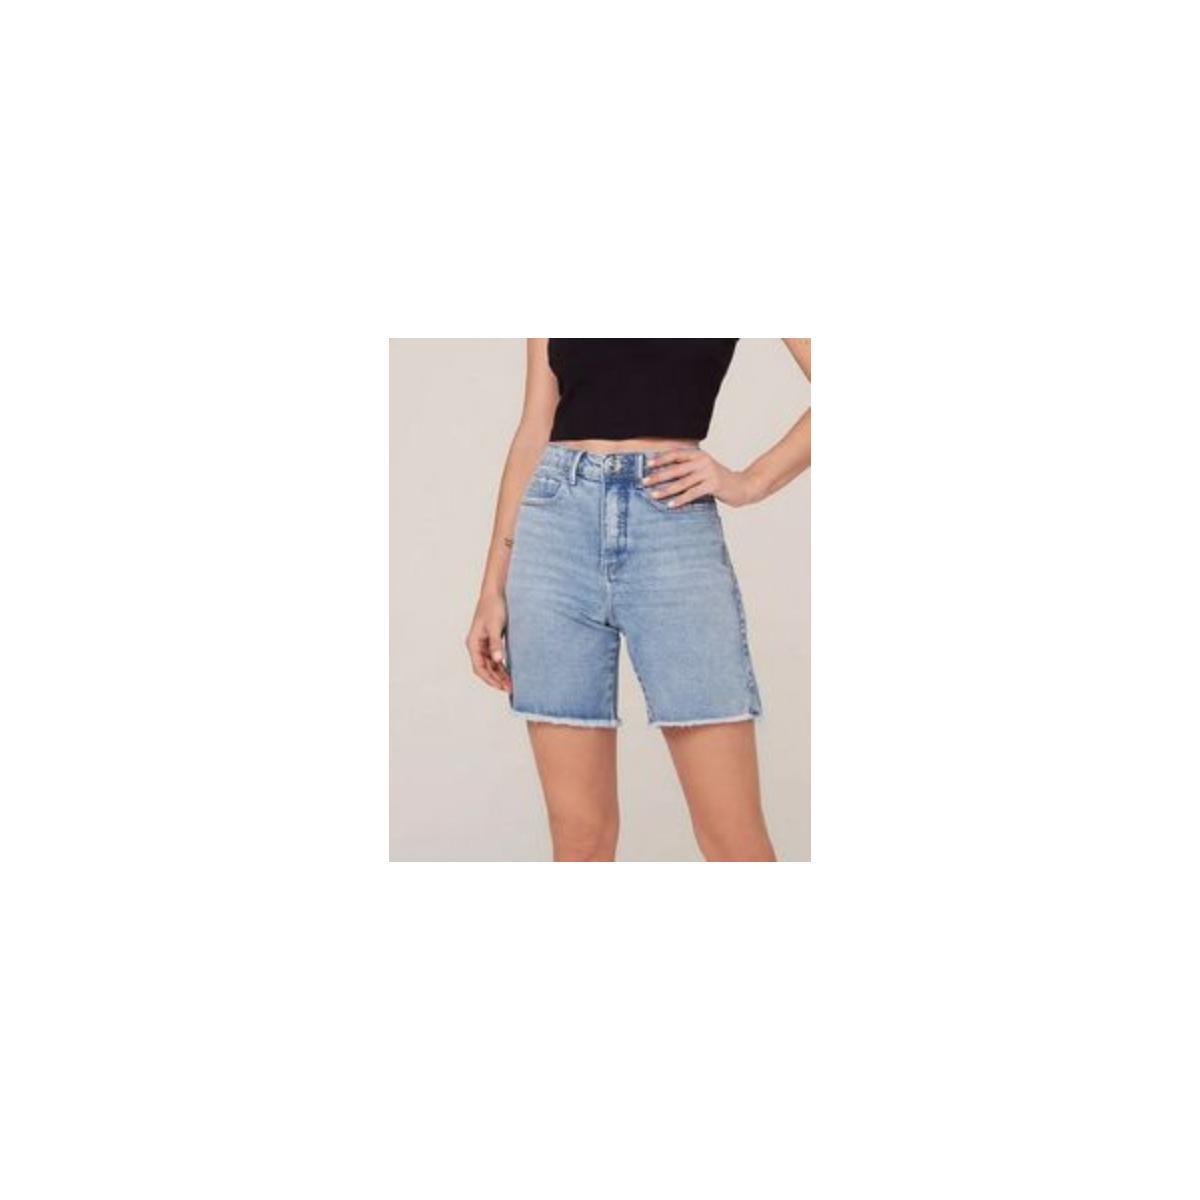 Bermuda Feminina Dzarm Zc4g 1bsn Jeans Claro